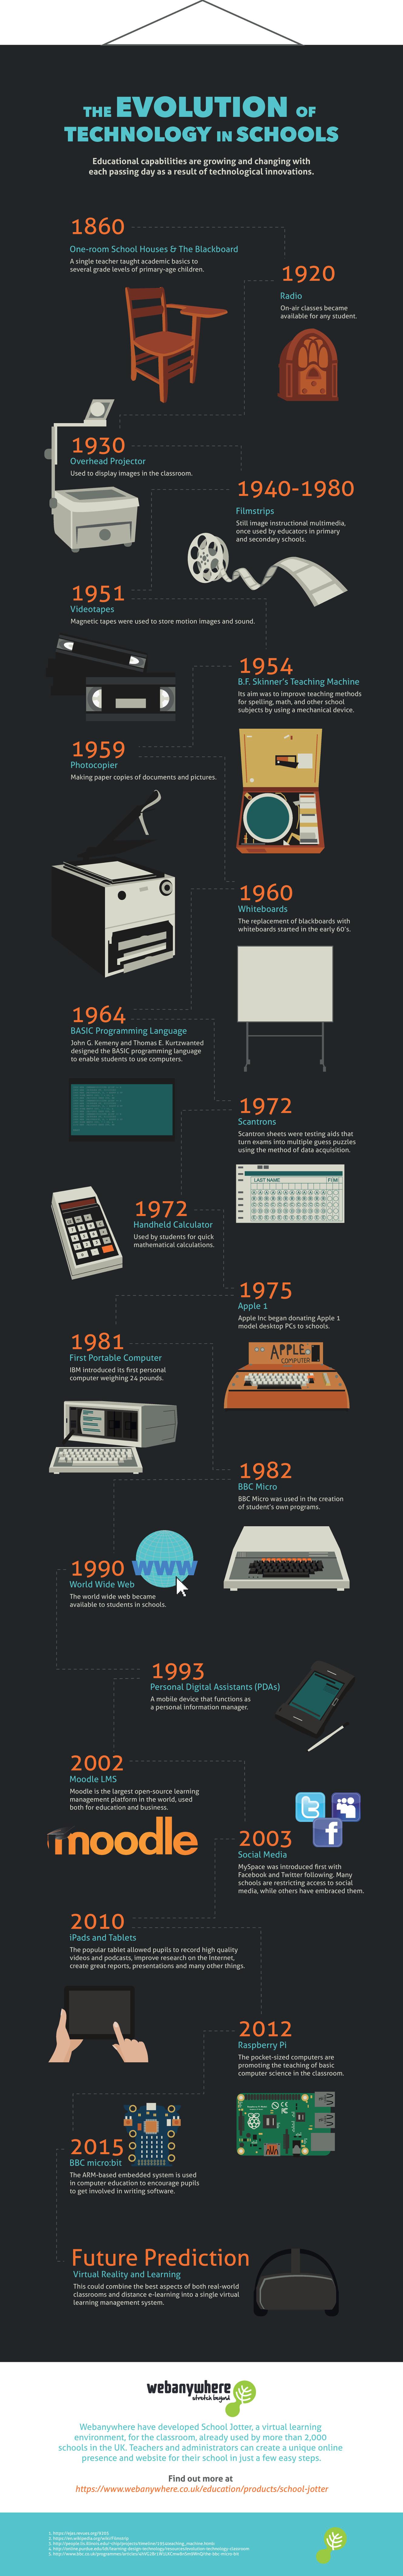 evolution of technology - 490×3134